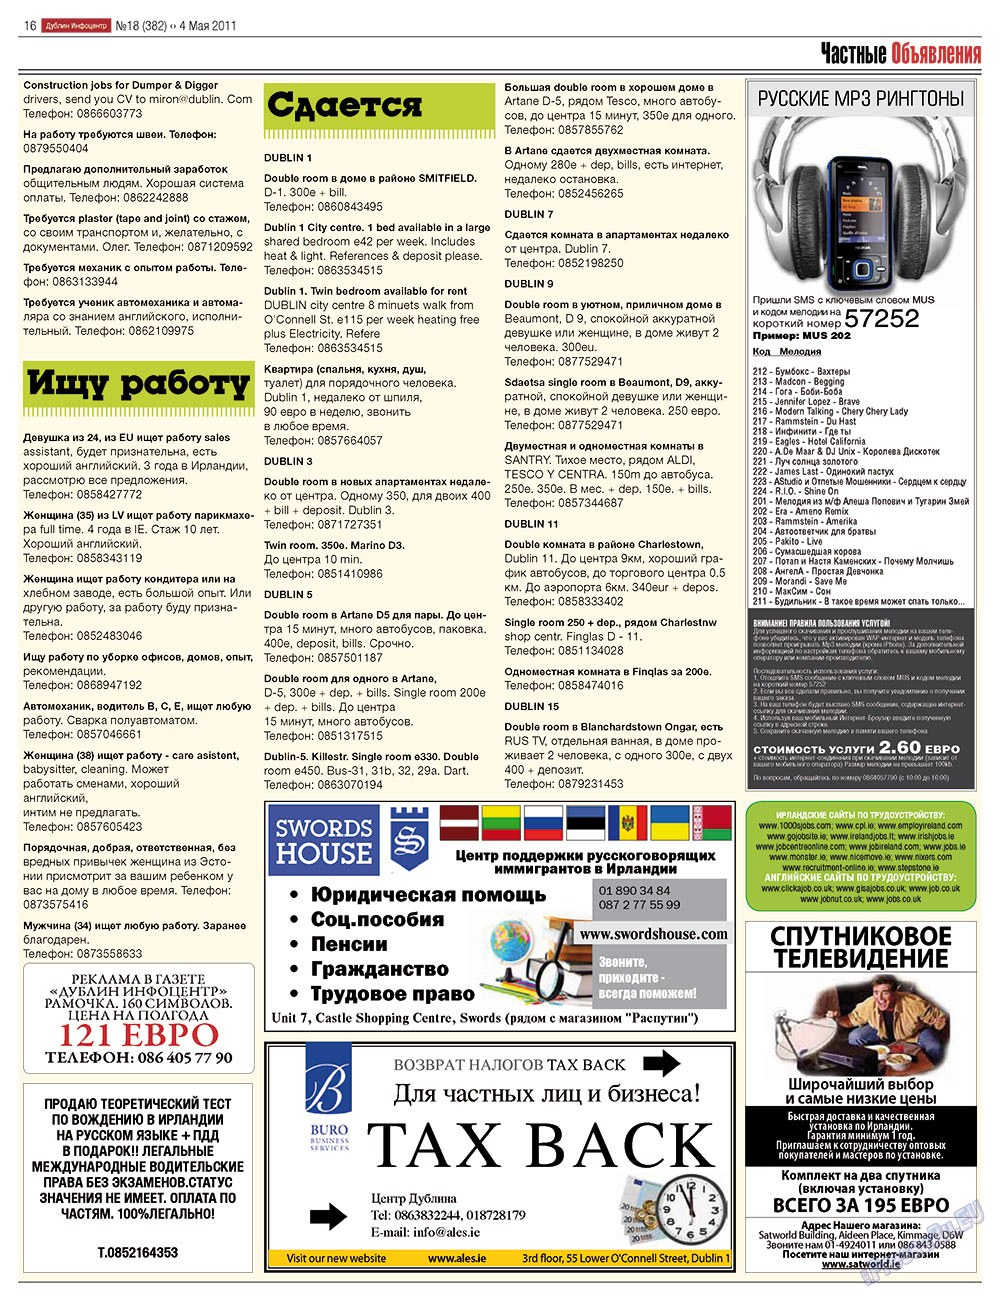 Дублин инфоцентр (газета). 2011 год, номер 18, стр. 16